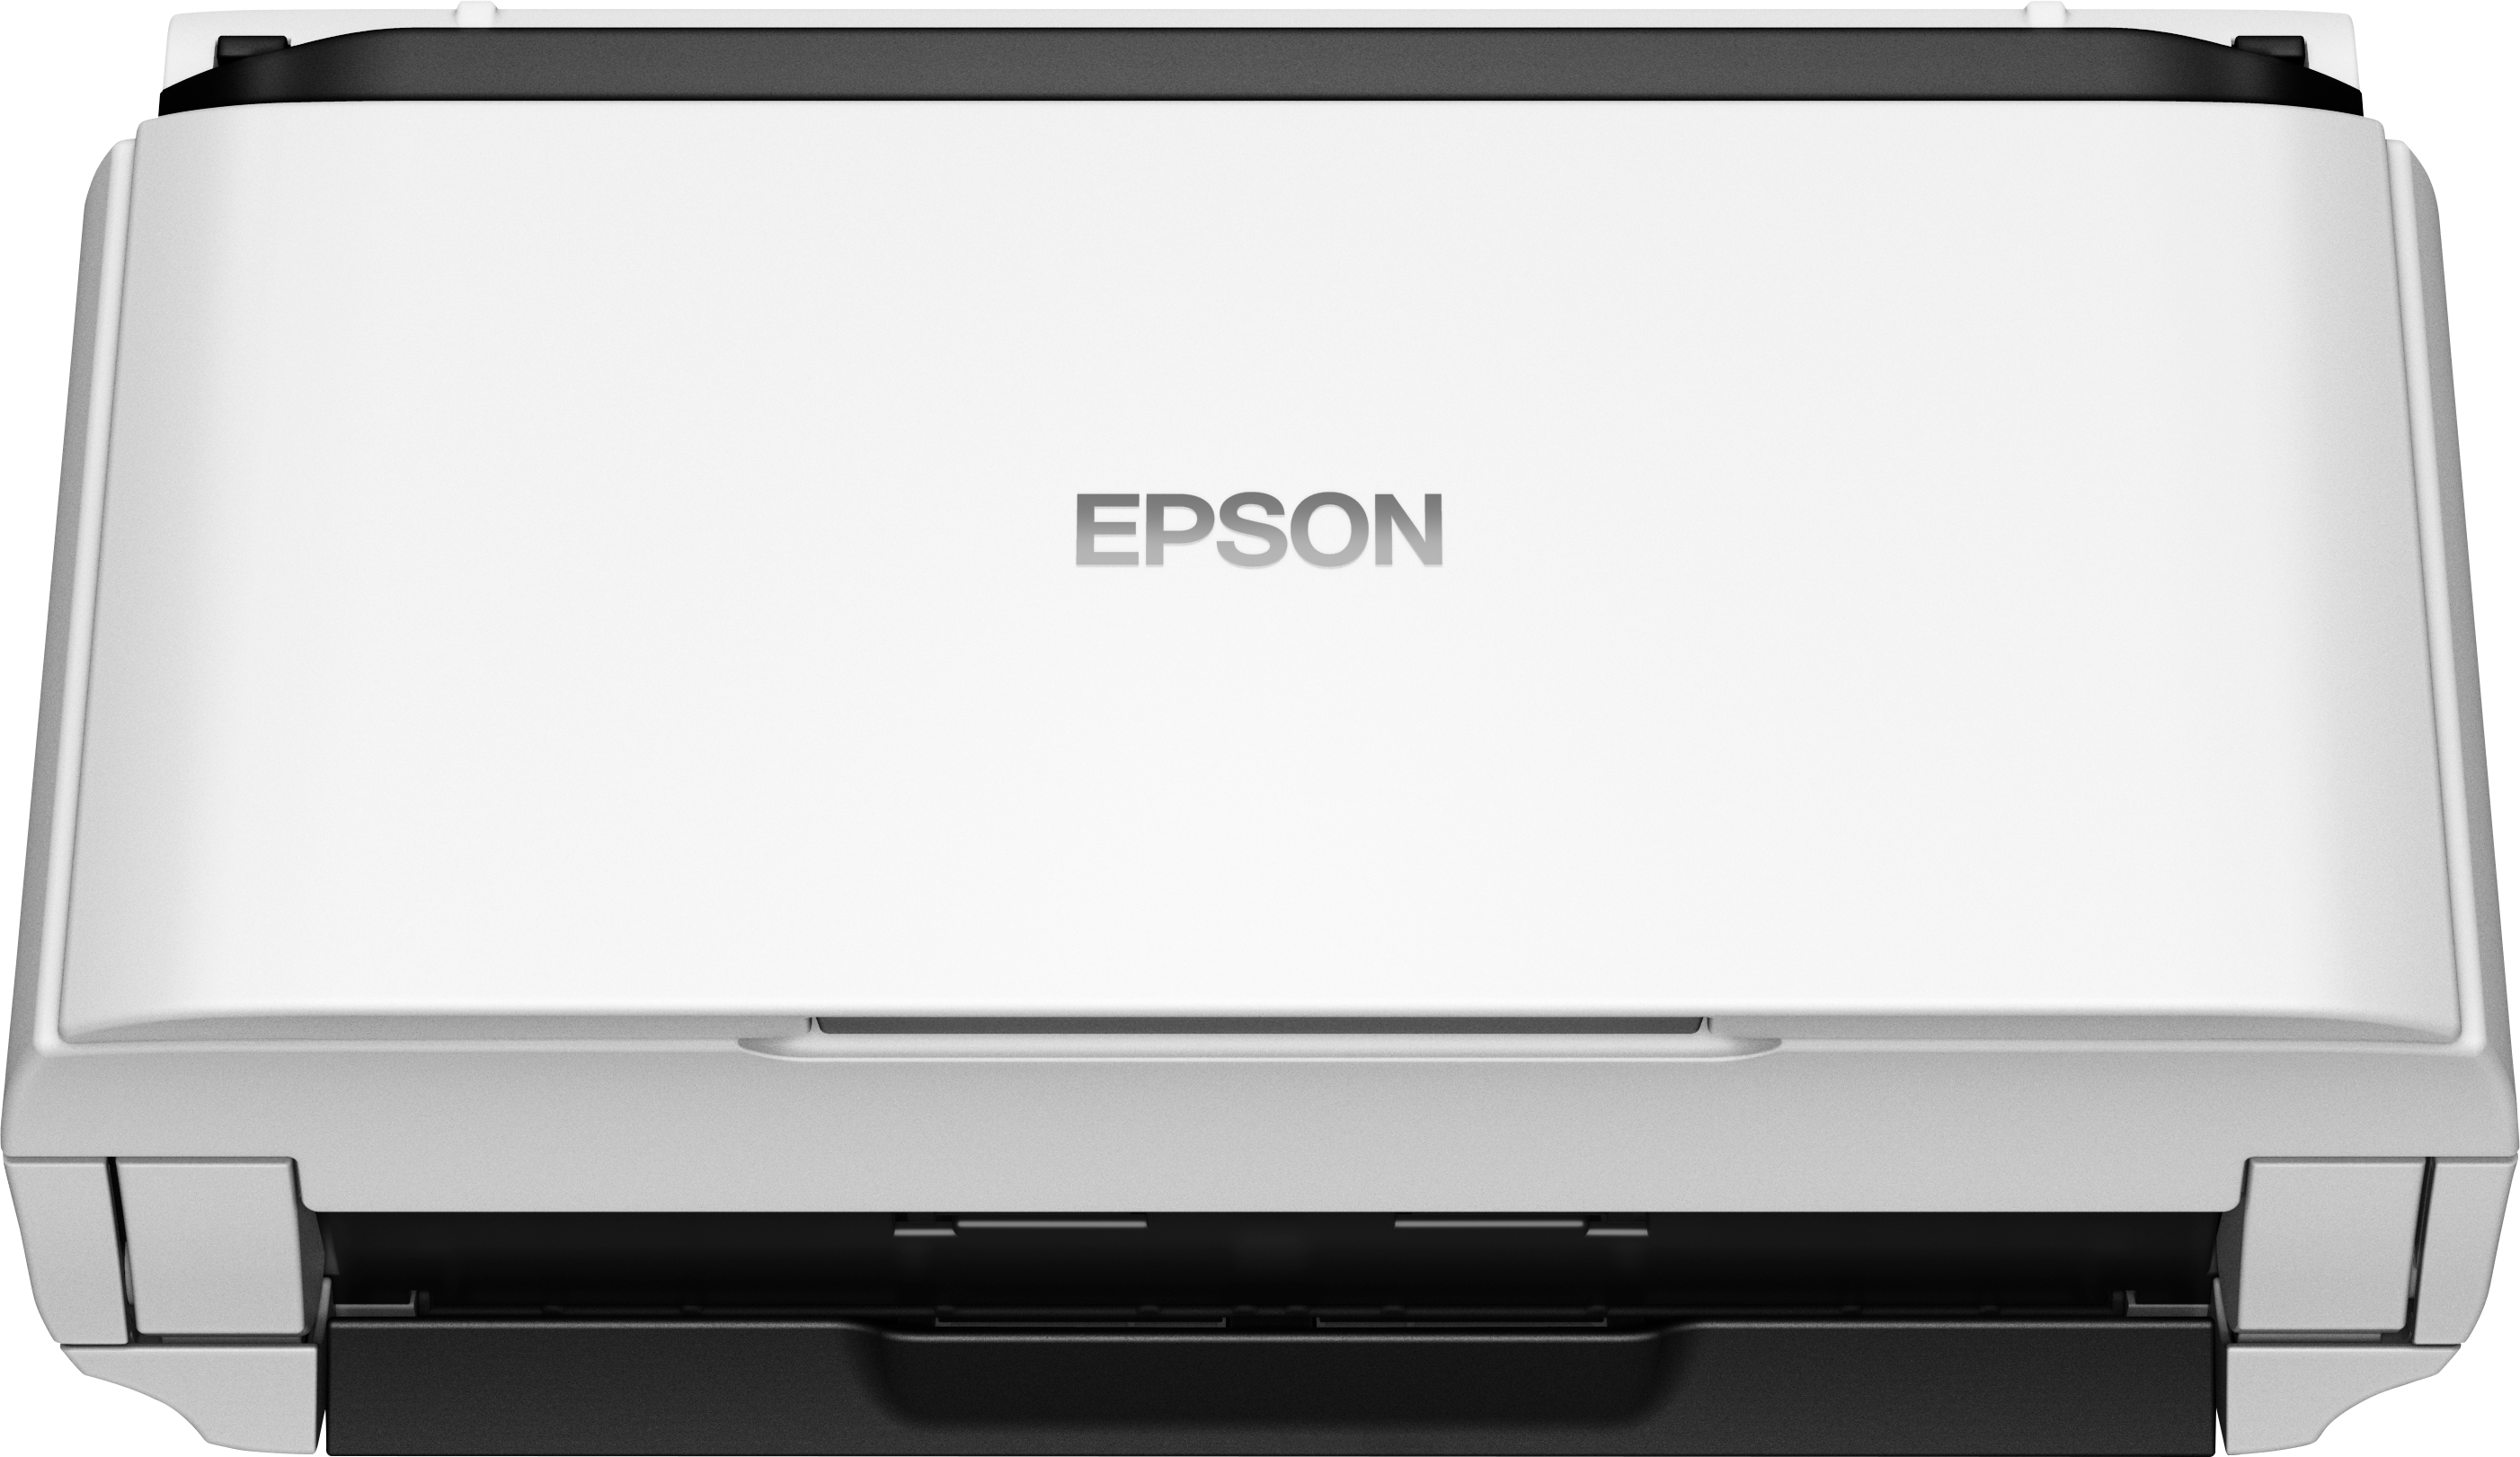 DS-410 Sheetfeed Scanner (600 dpi, 48-bit, 26 ppm, duplex scanning, USB)